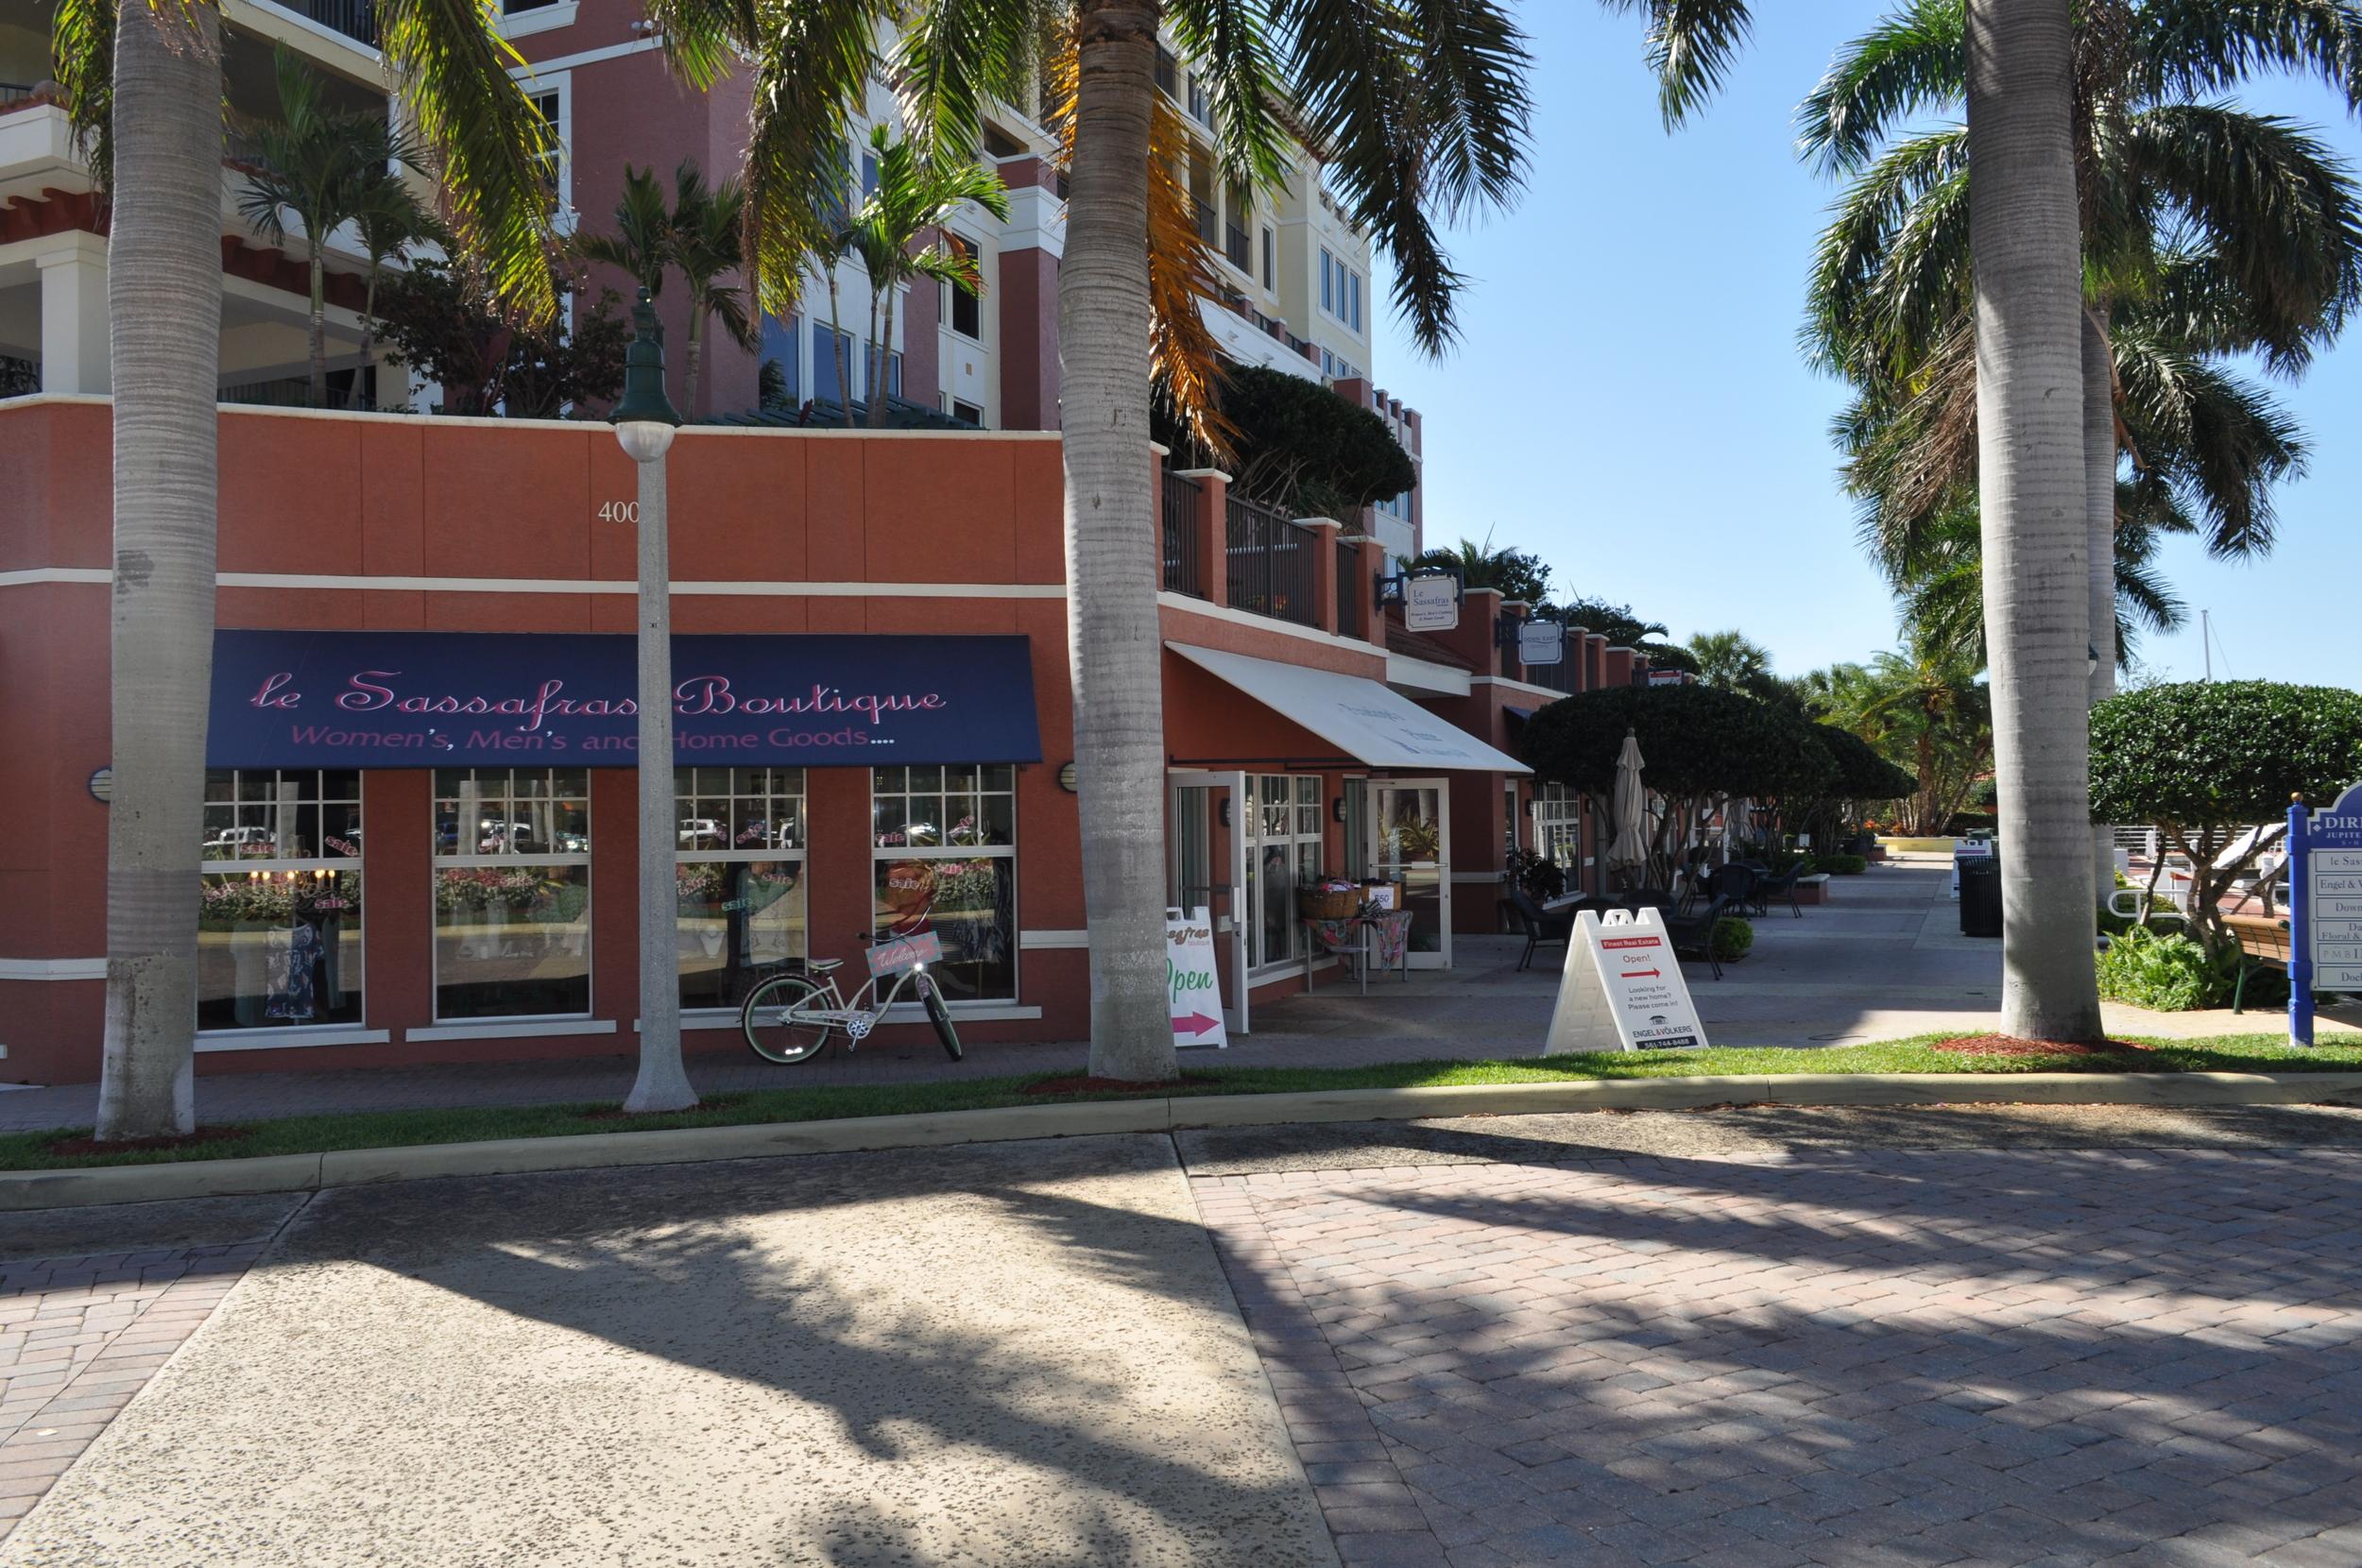 Jupiter Yacht Club Florida Retail Shops.JPG